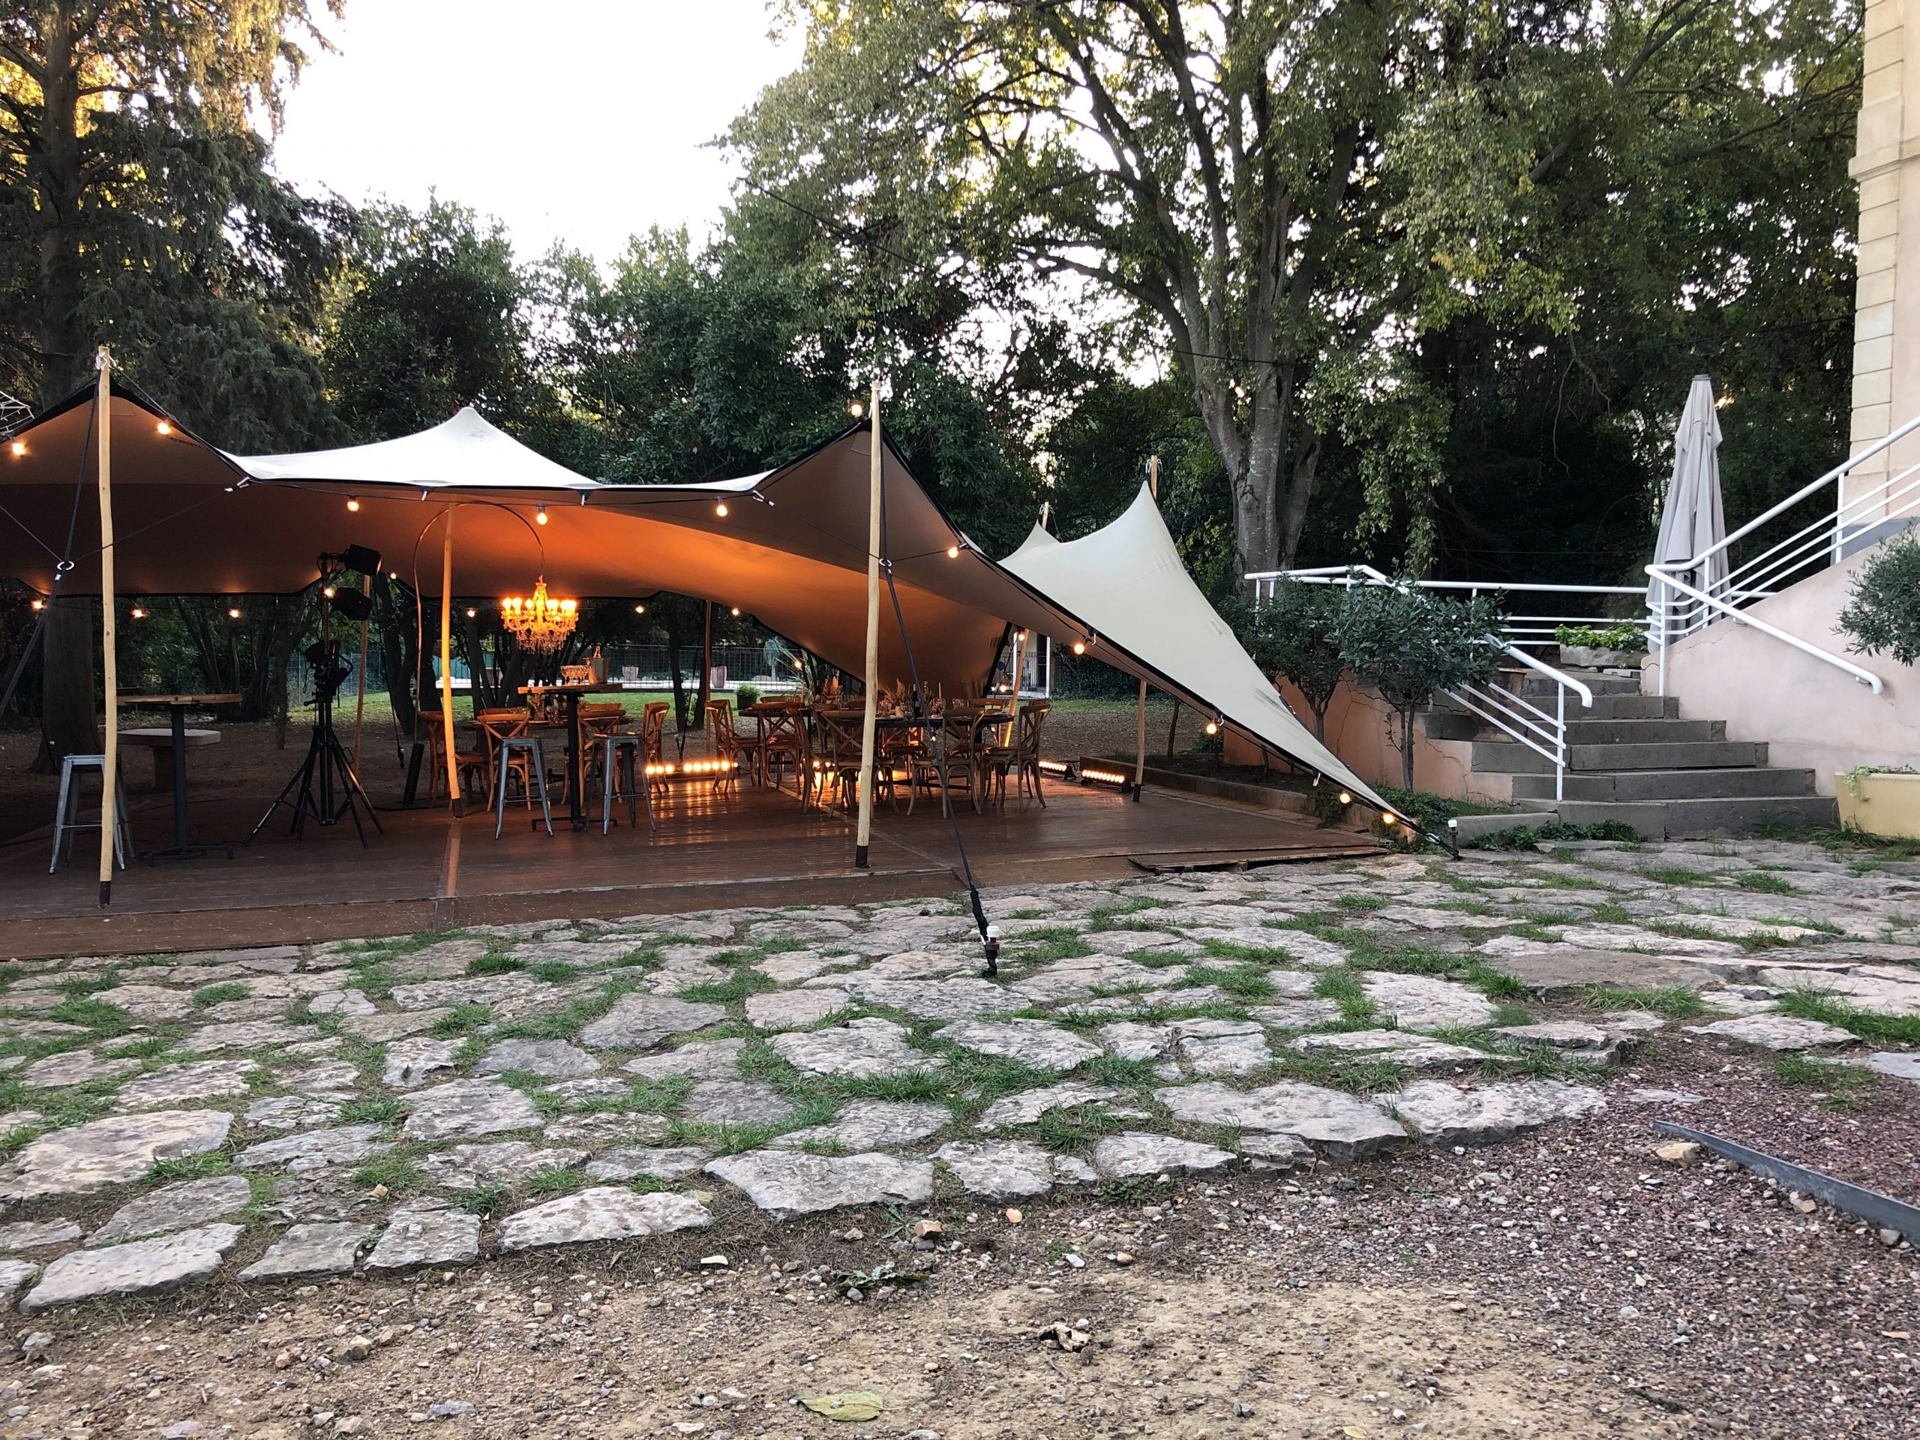 location chapiteau tente Barnum nomade stretch Montpellier Nimes